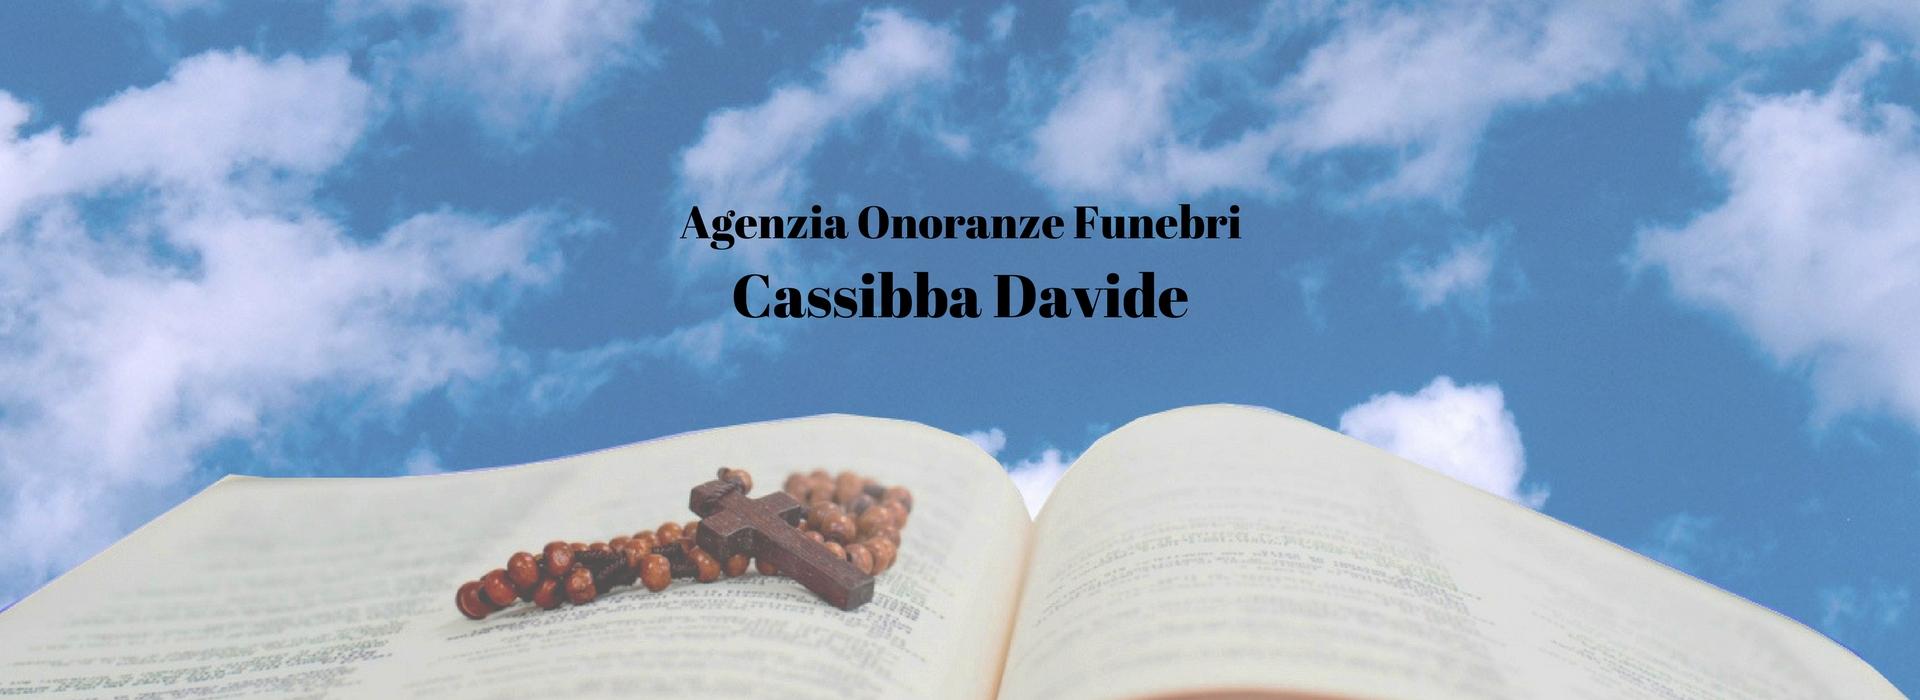 Agenzia Onoranze Funebre